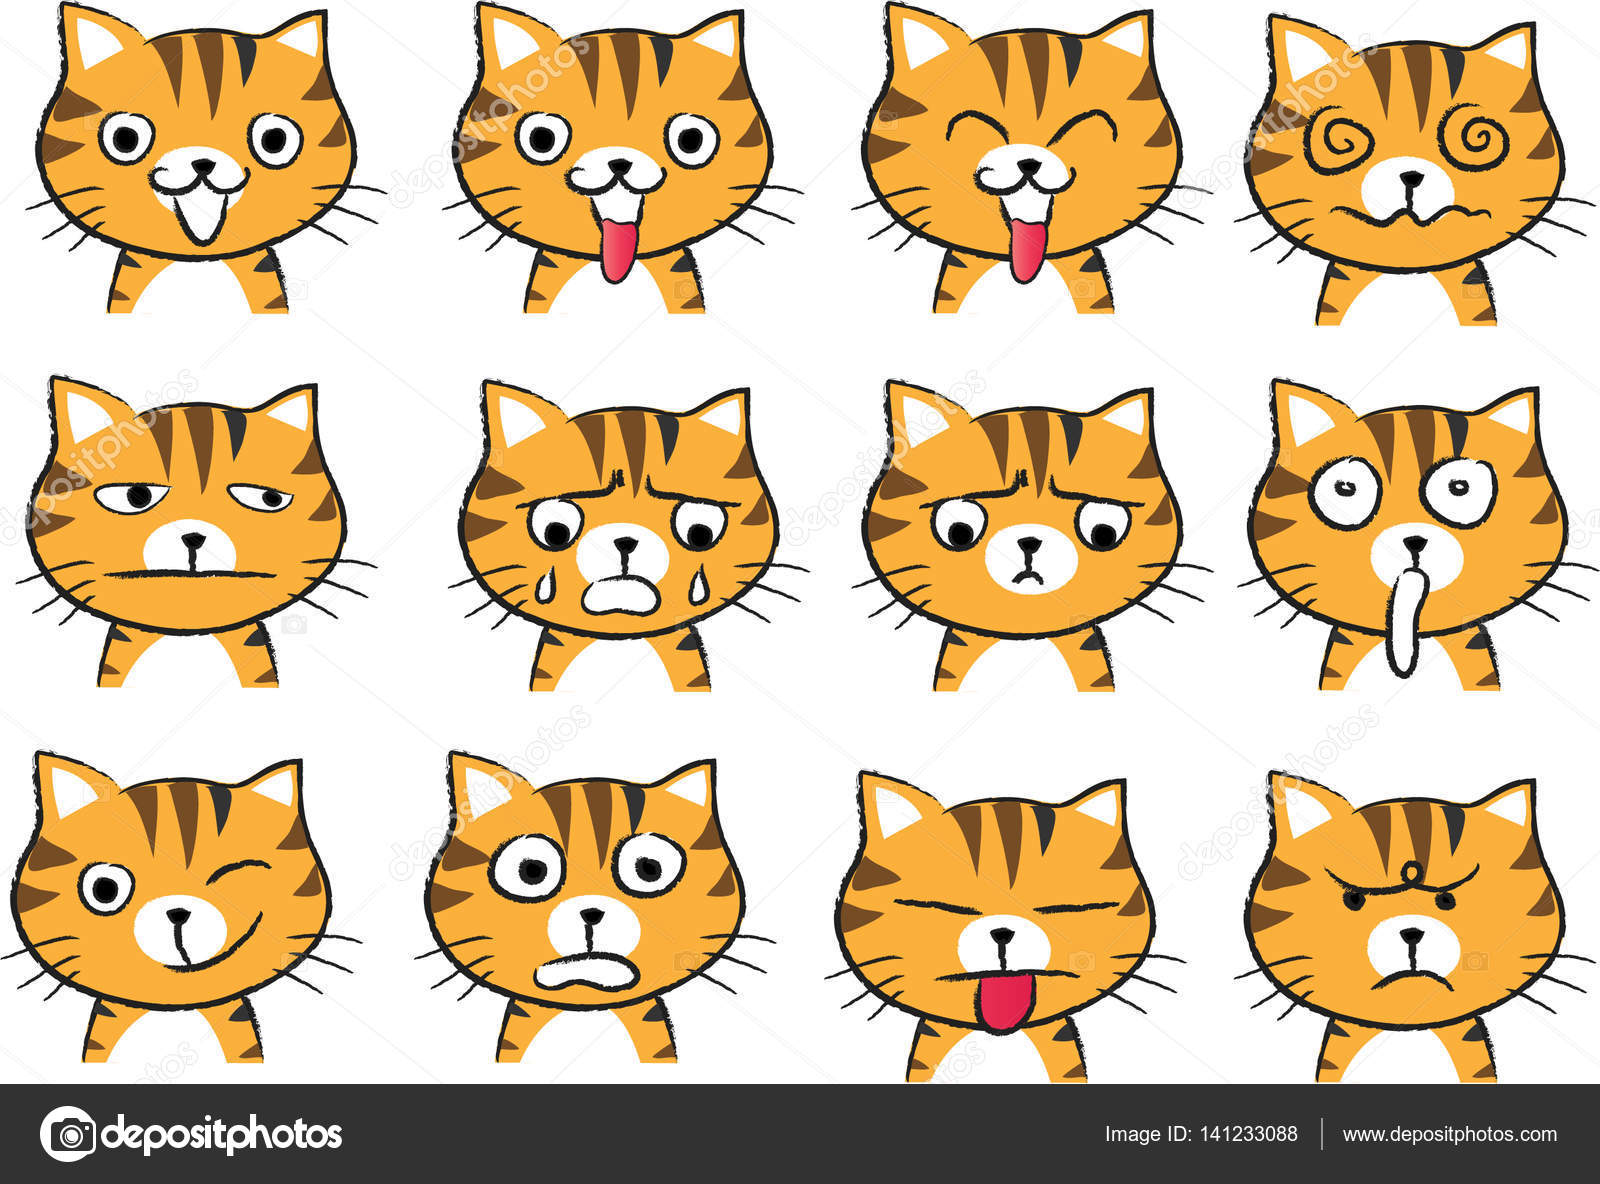 Imágenes Caras De Gatos Para Dibujar Cara De Gato De Dibujos